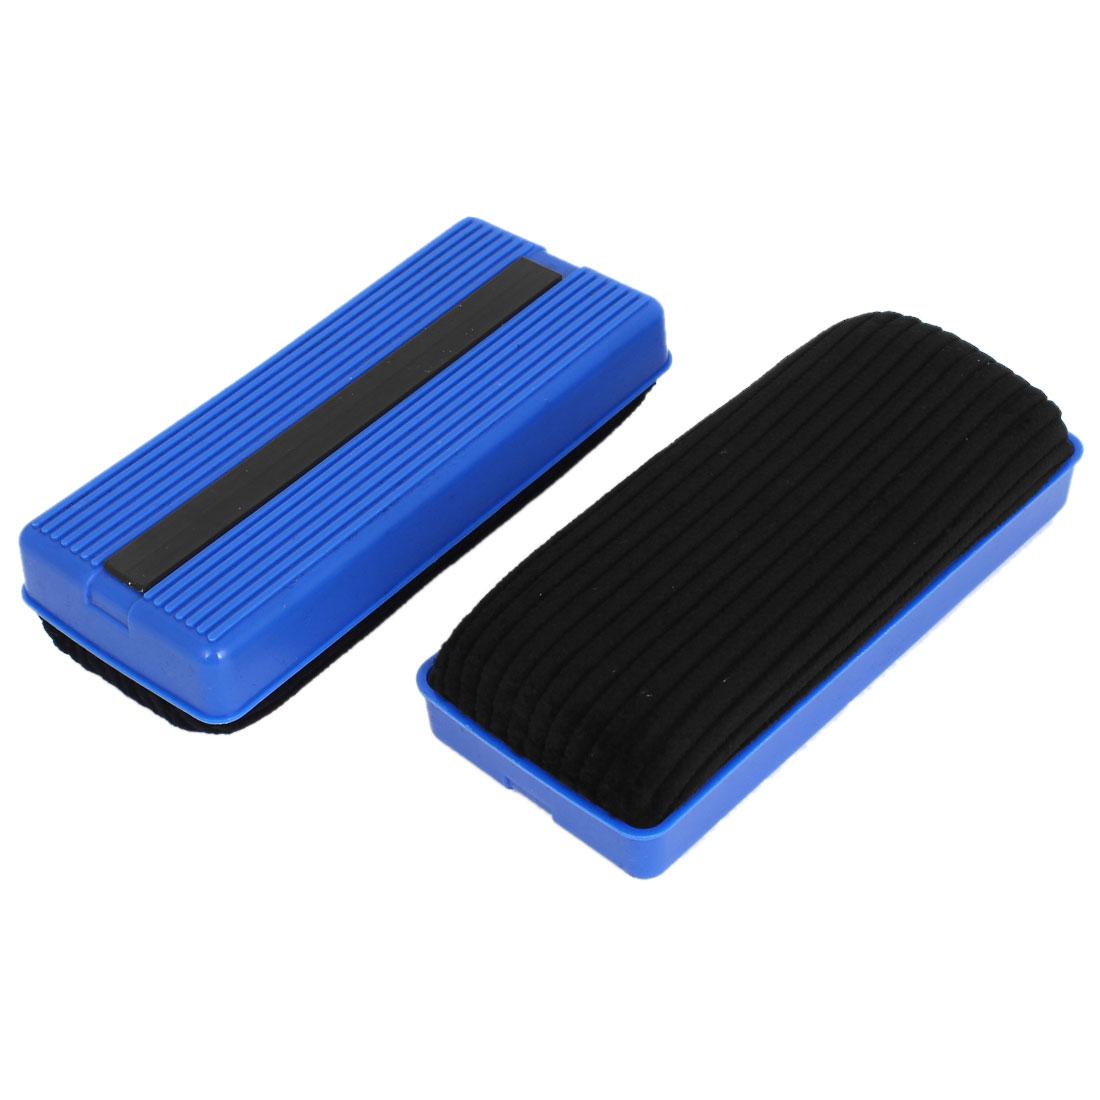 School Plastic Shell Rectangle Magnetic Erase Blackboard Eraser Chalk Marker Cleaner Blue Black 2 Pcs